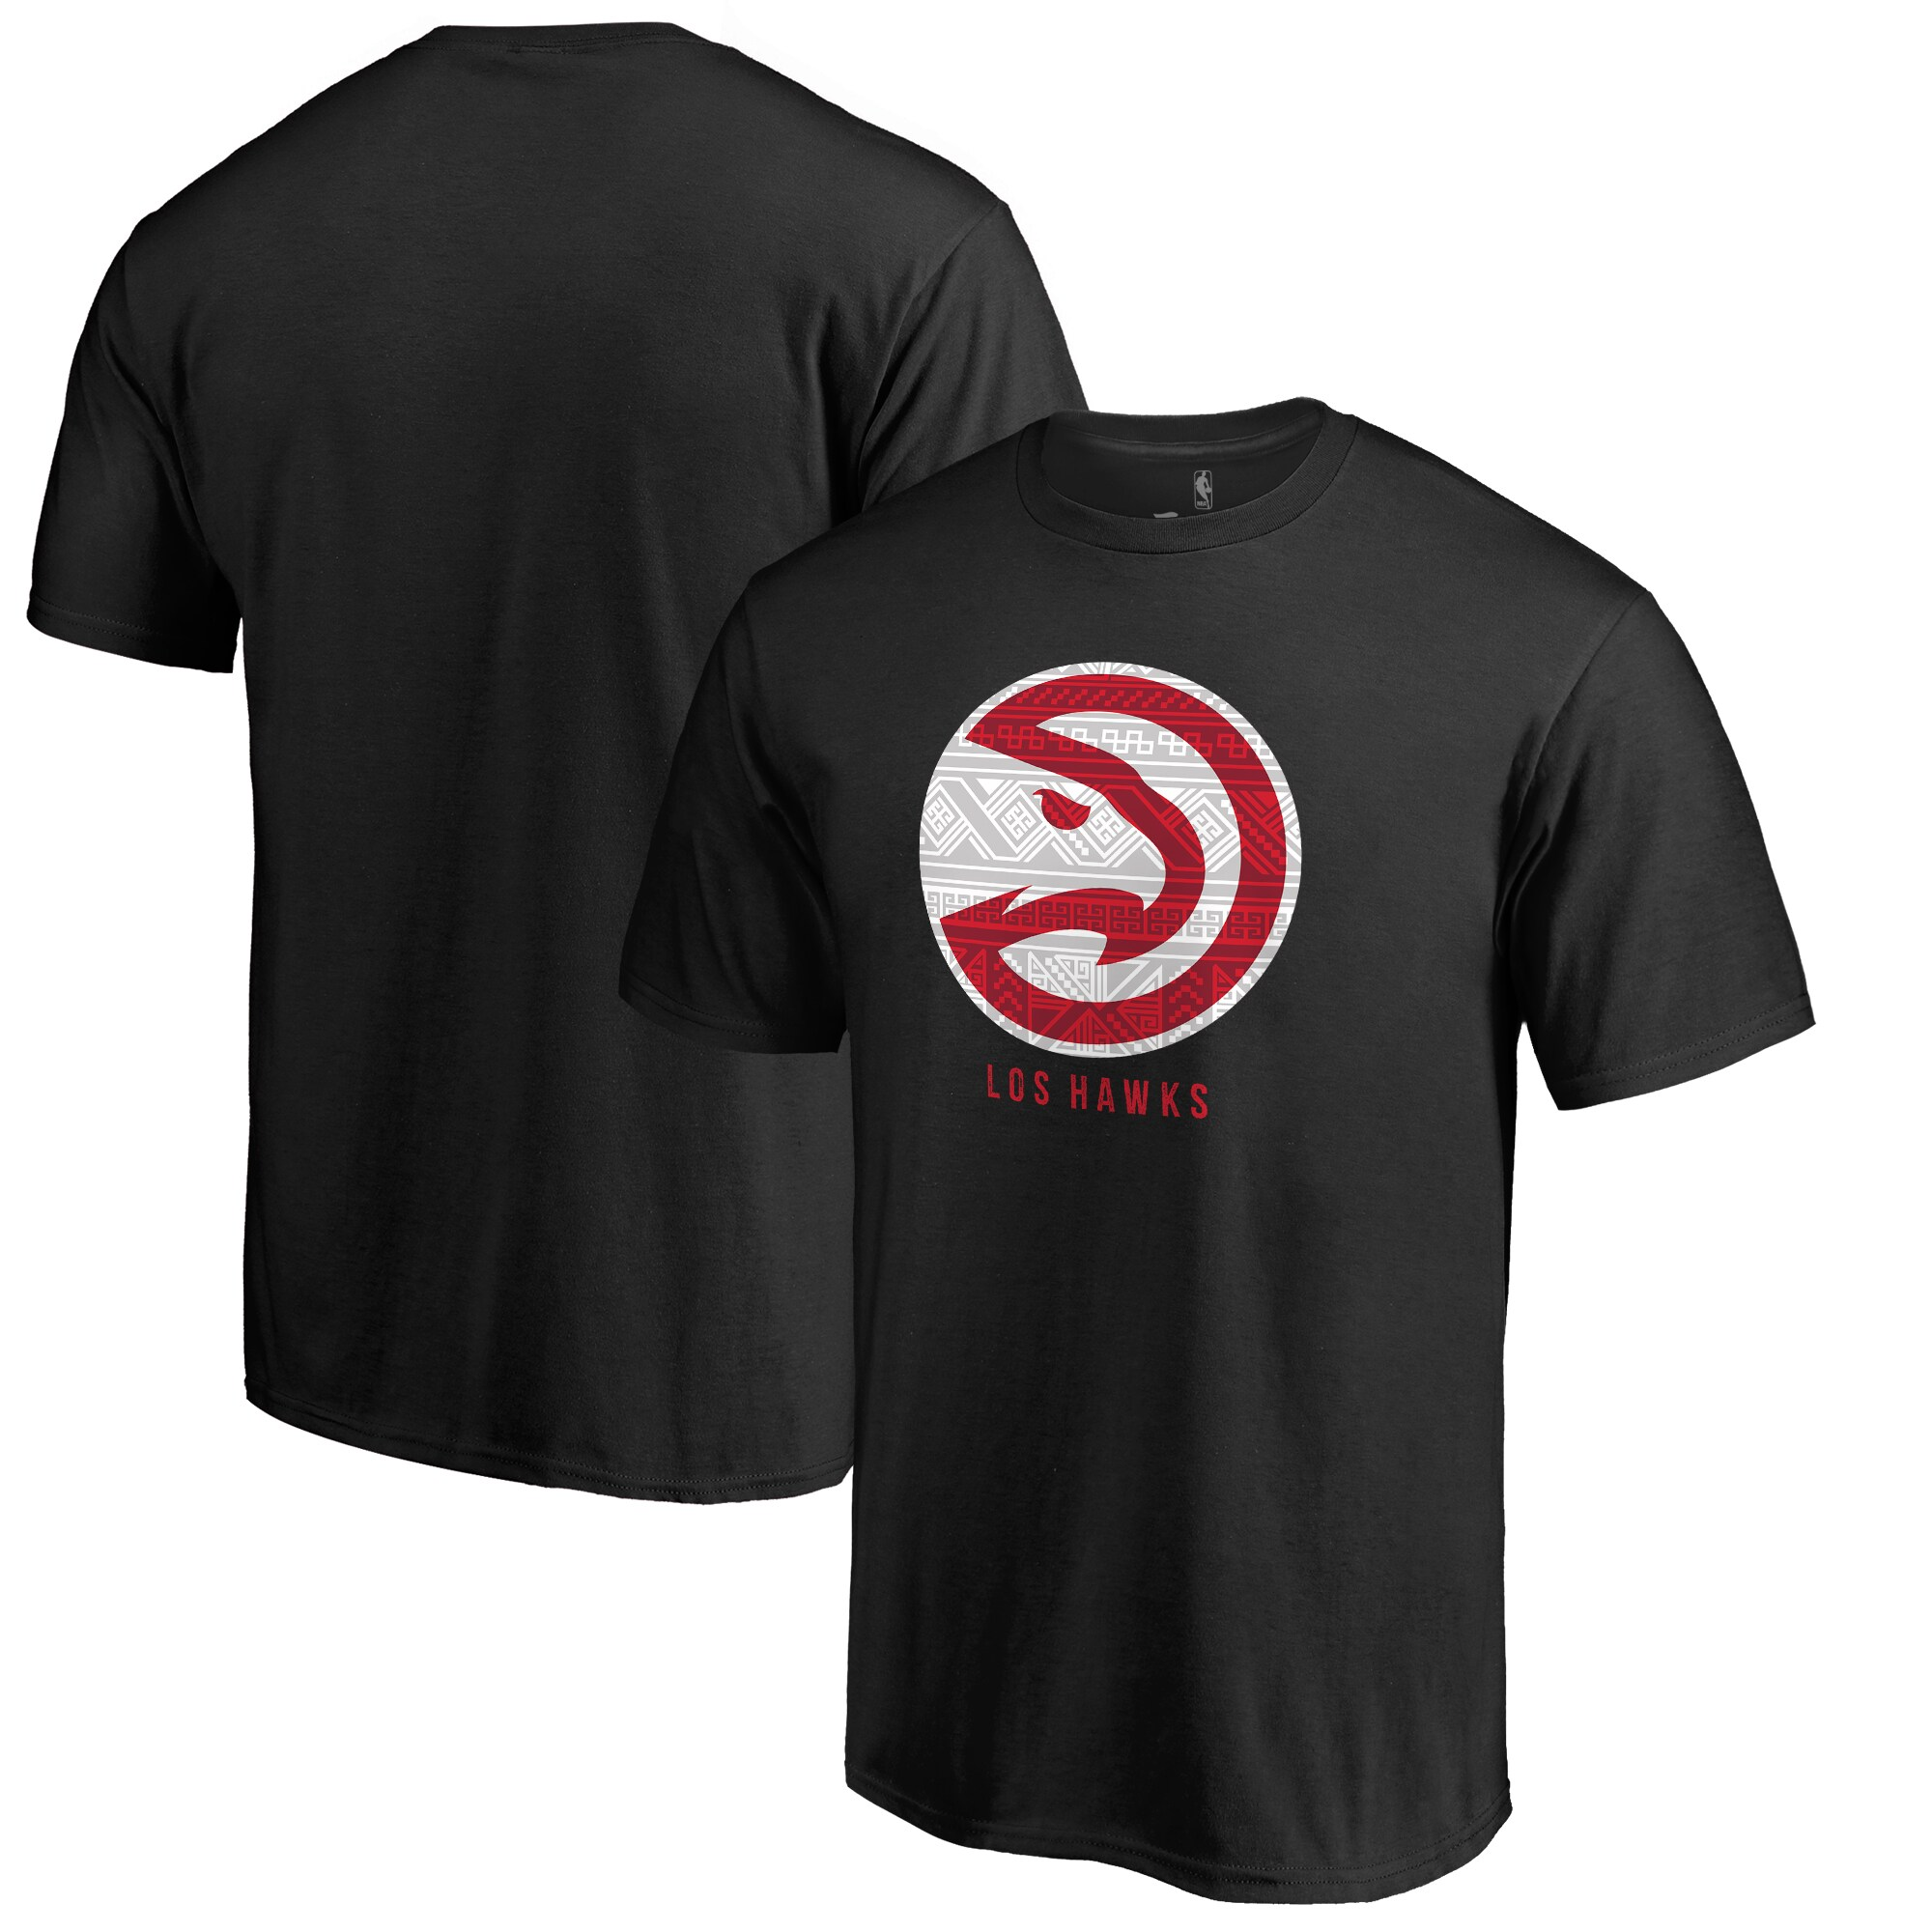 Atlanta Hawks Fanatics Branded 2017 Noches Éne-Bé-A T-Shirt - Black